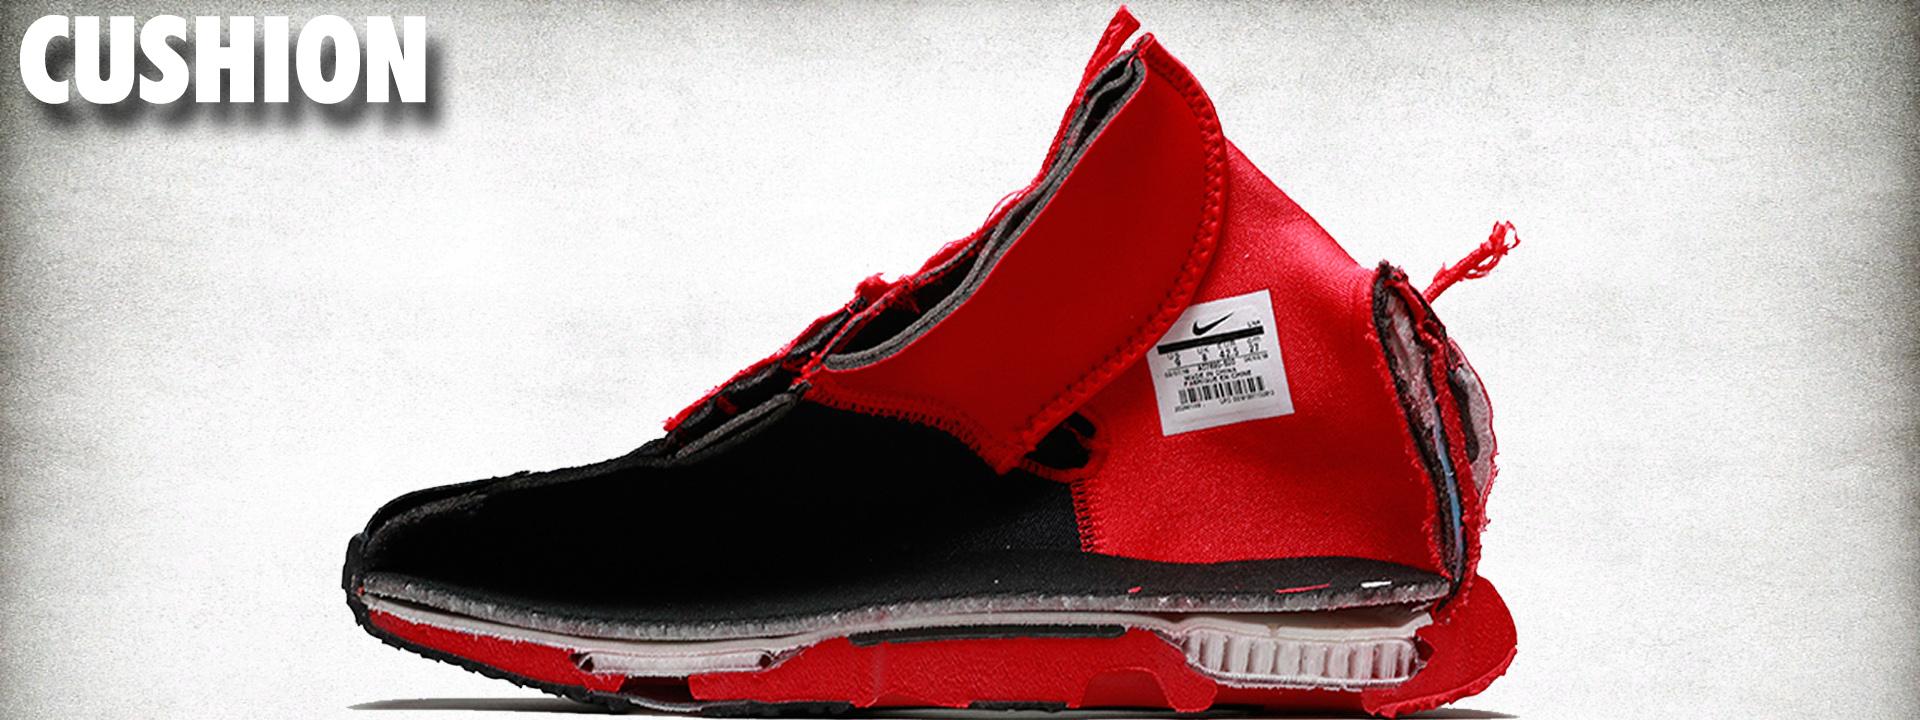 202f77db725f Nike-Hyperdunk-X-Performance-Review-Duke4005-Cushion - WearTesters